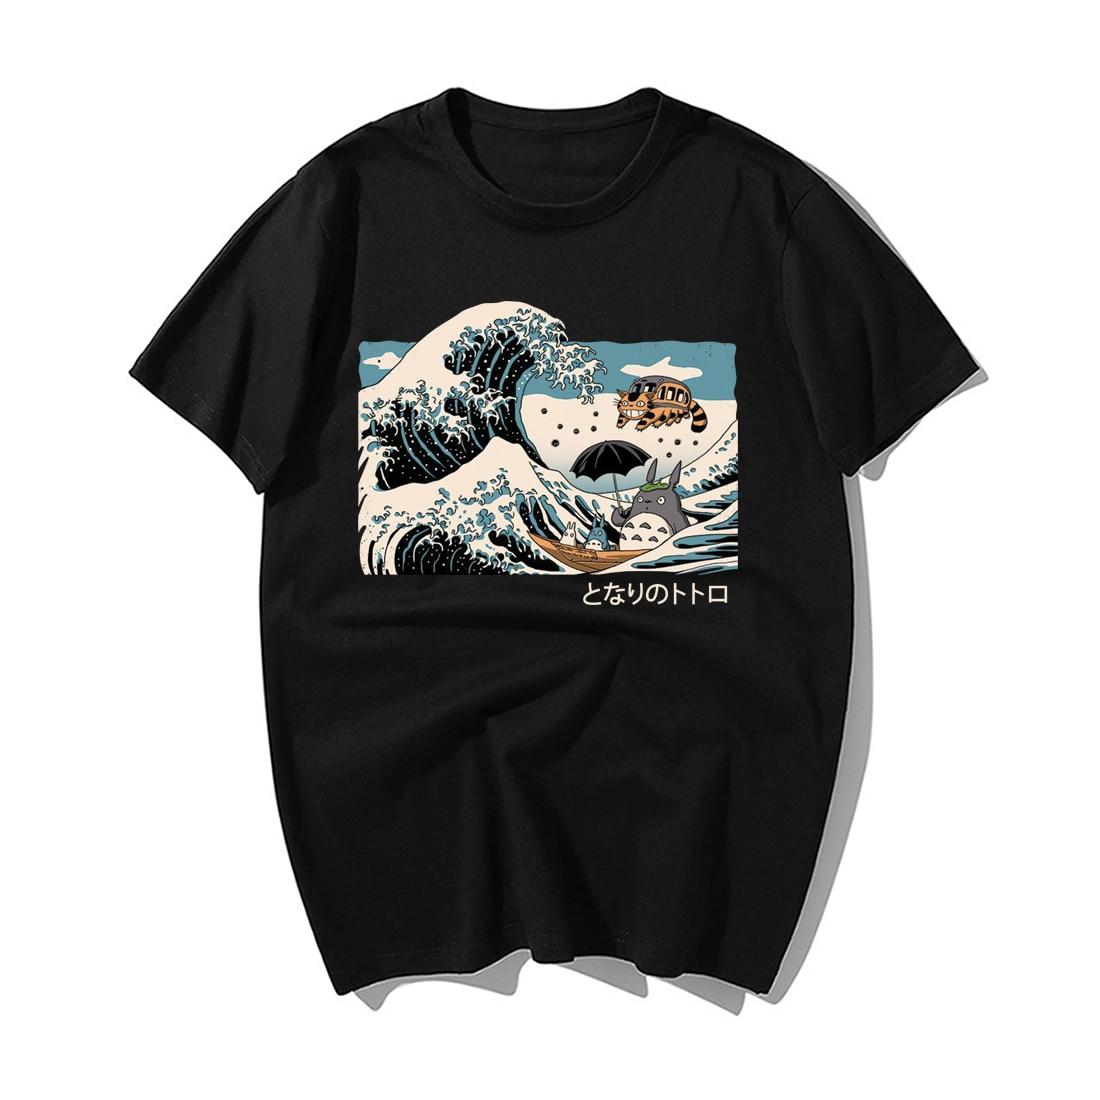 Classic Vintage Japanese Anime Tonari No Totoro Print T Shirt Funny Men Summer Casual Cotton Short Sleeve Tshirts Male Tops Tees